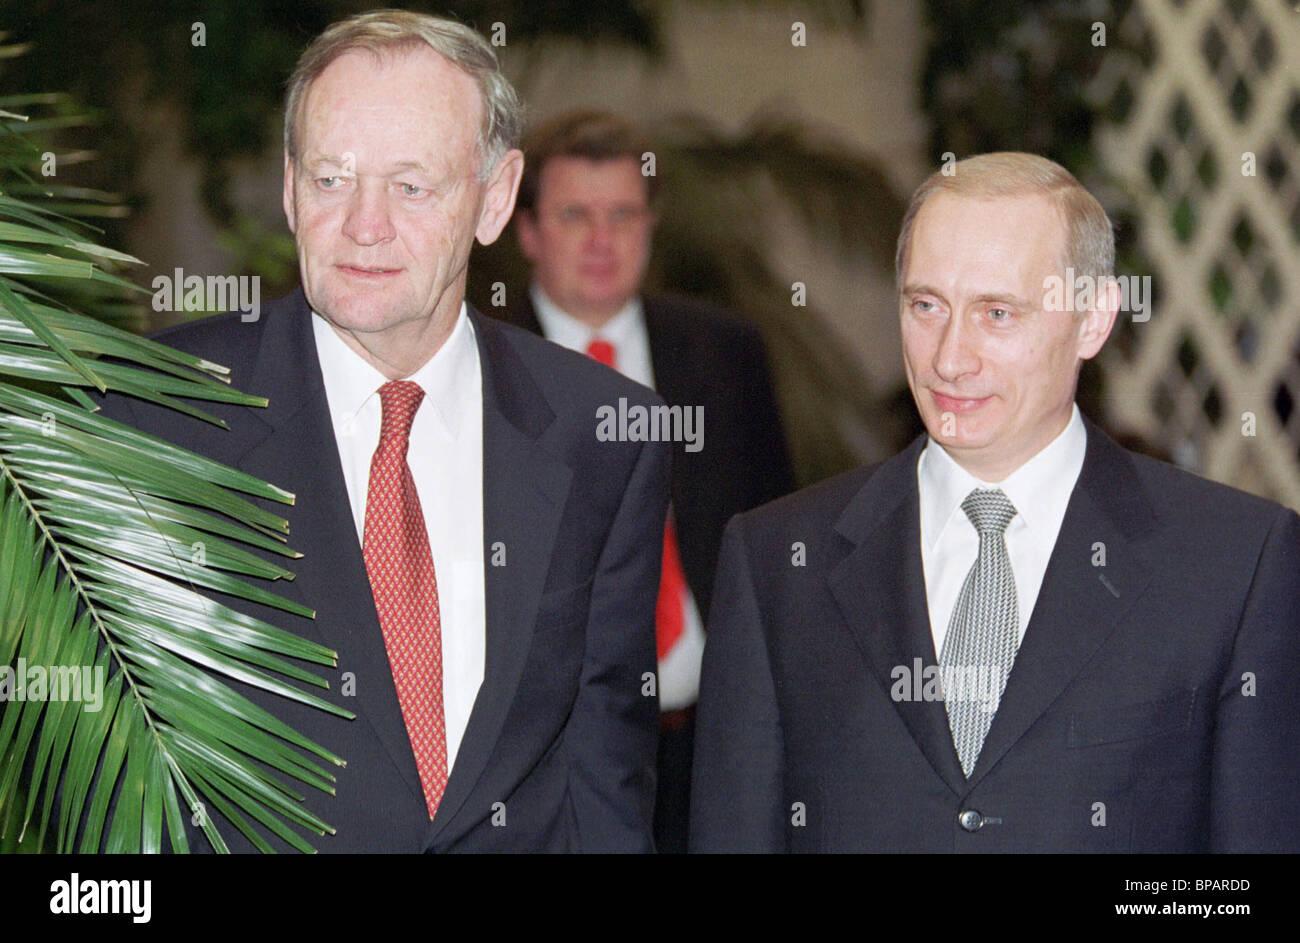 Russian president, Canadian PM taking visiting Kremlin's winter garden - Stock Image